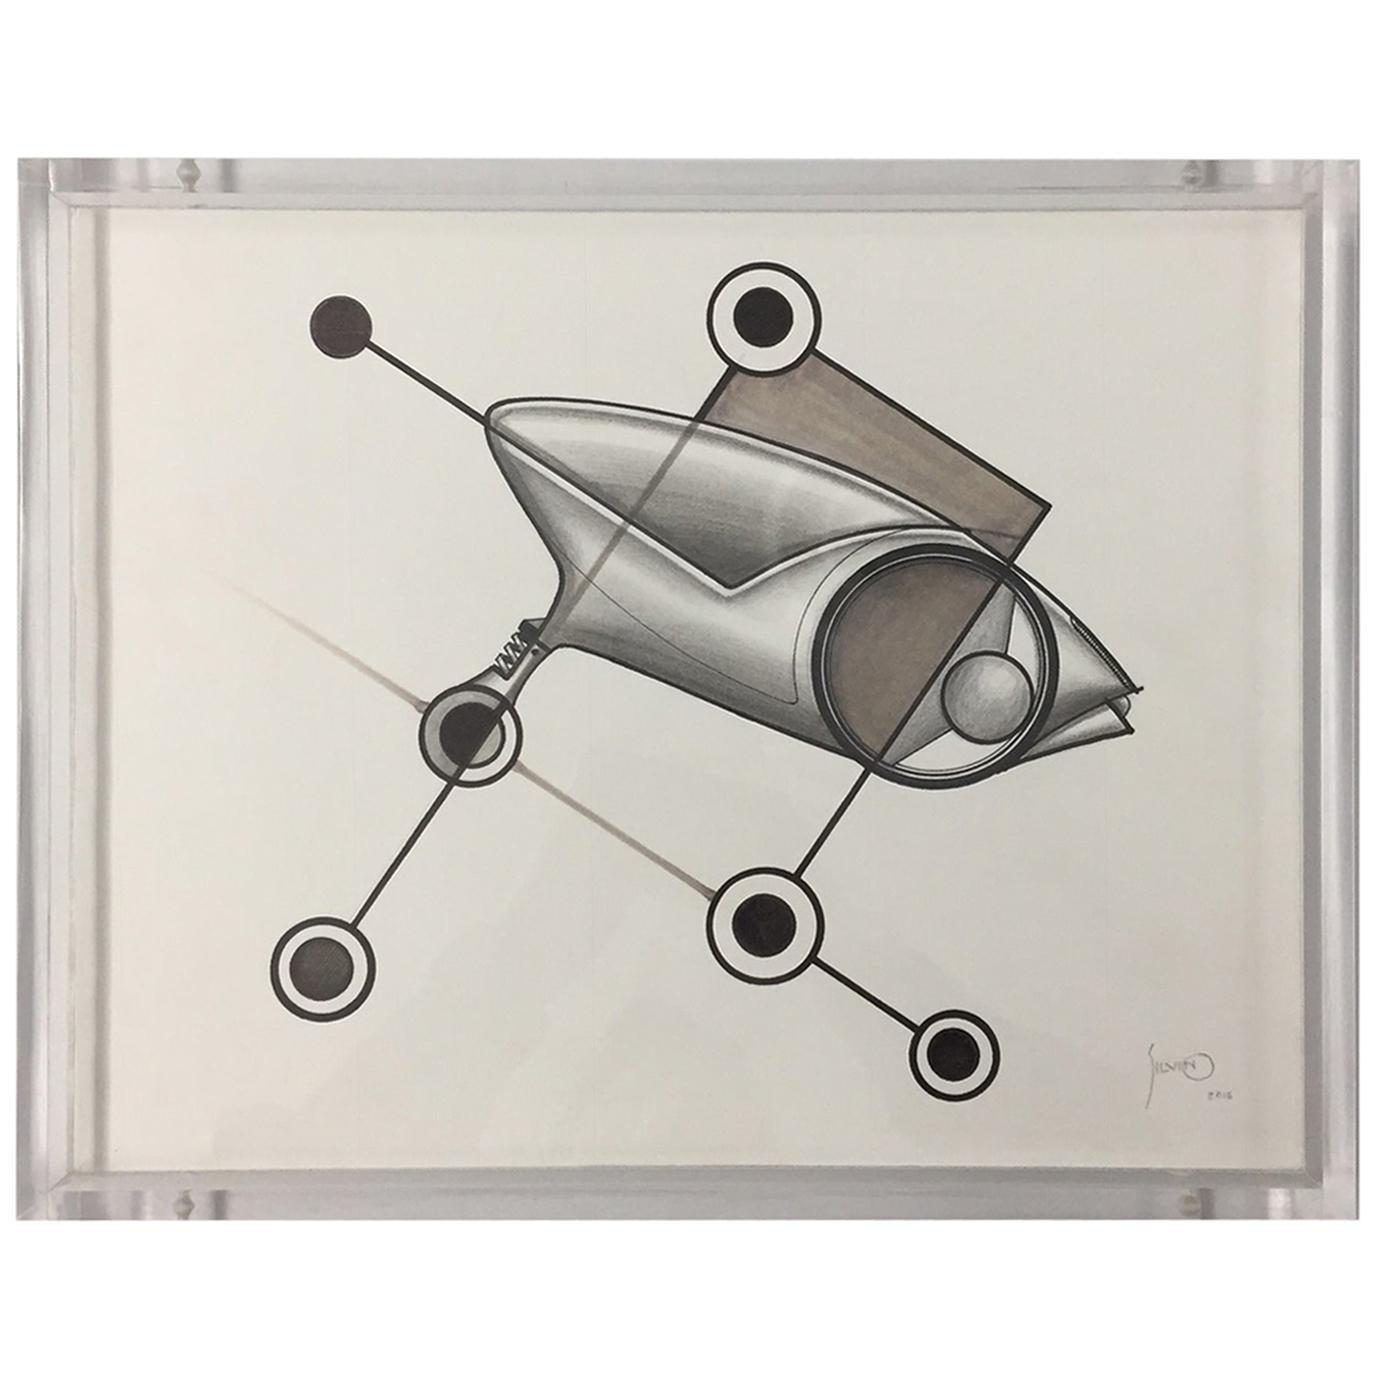 Drawings / Trimoto / Artist /Silvino Lopeztovar